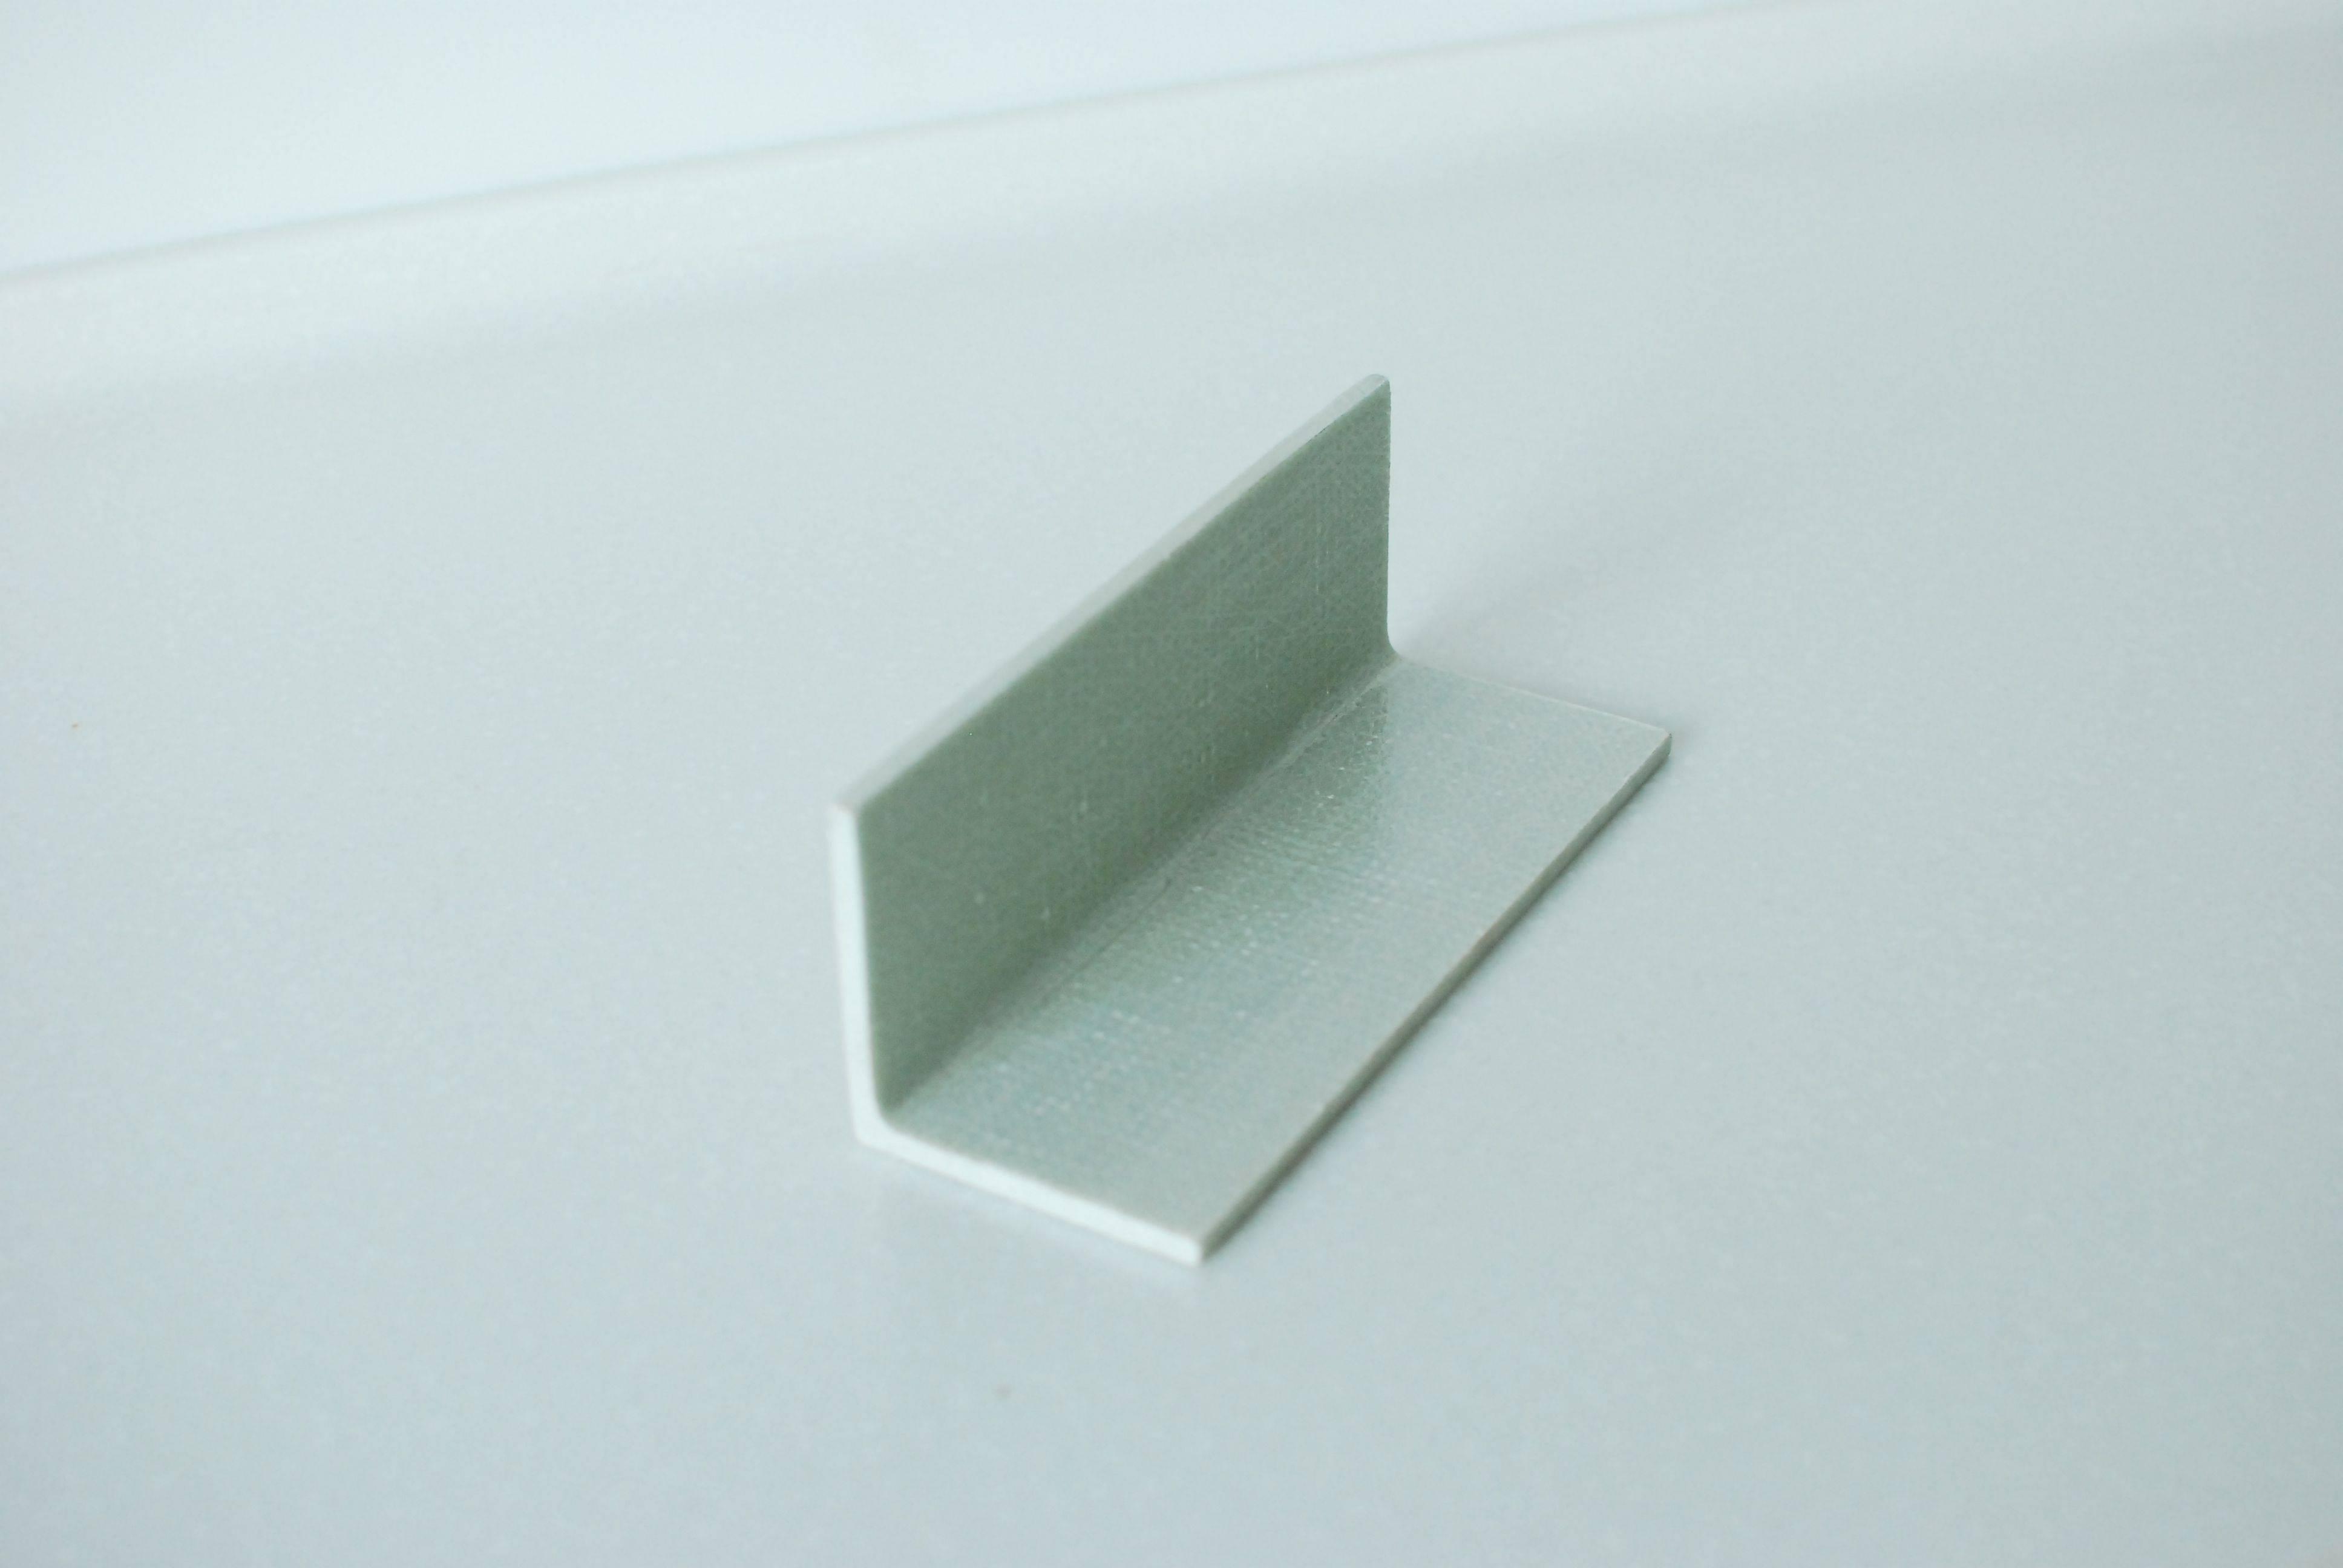 High Strengh FRP Angle Profile